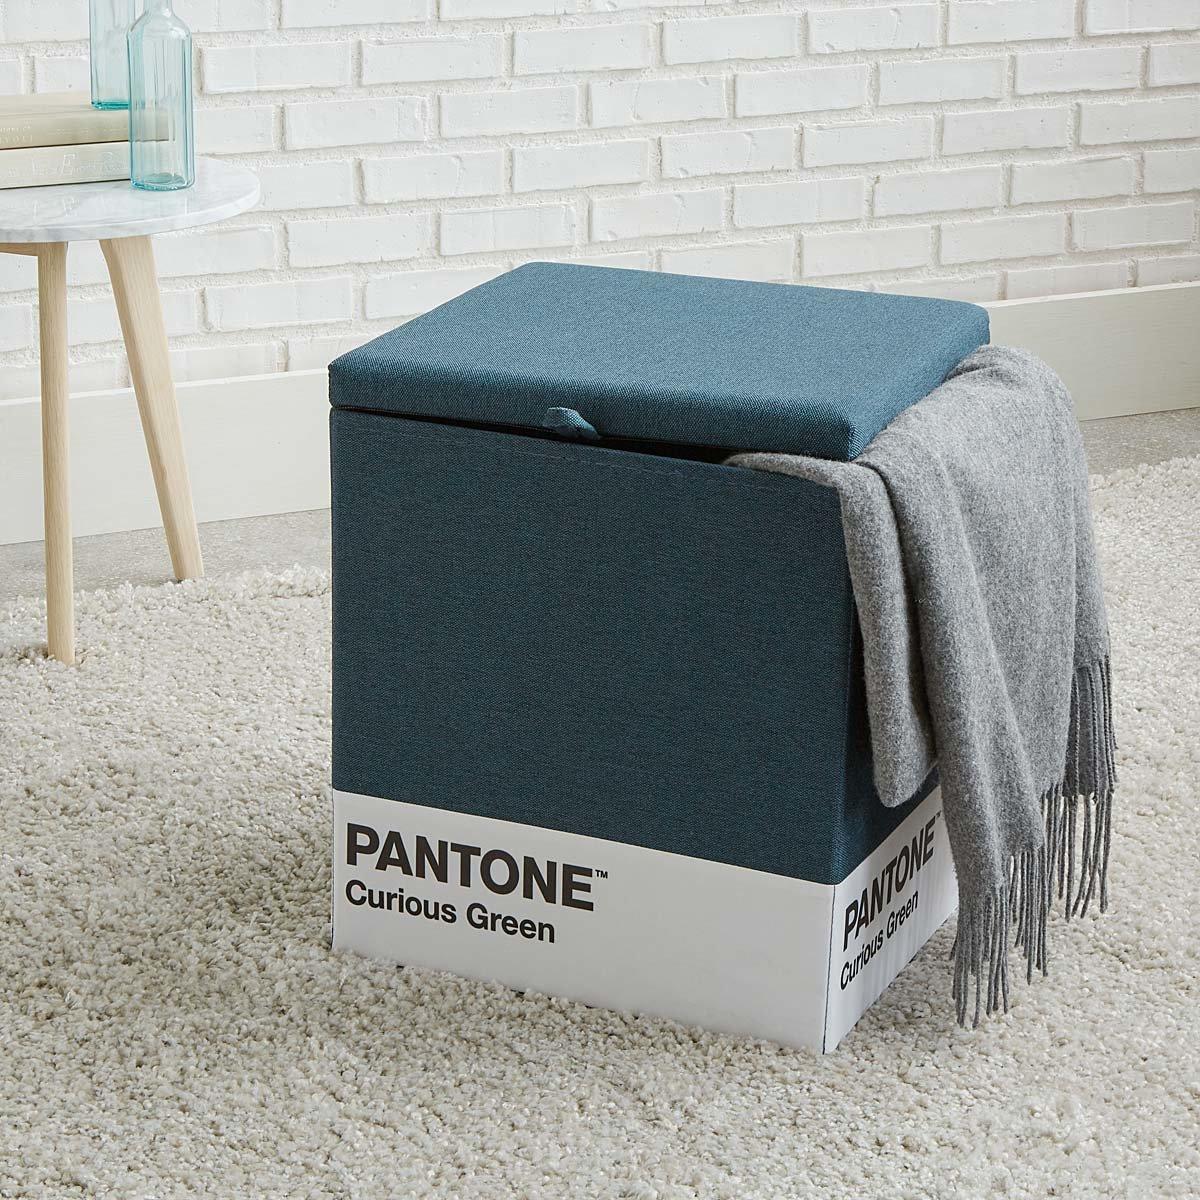 Pantone Storage Stool 1 Thumbnail